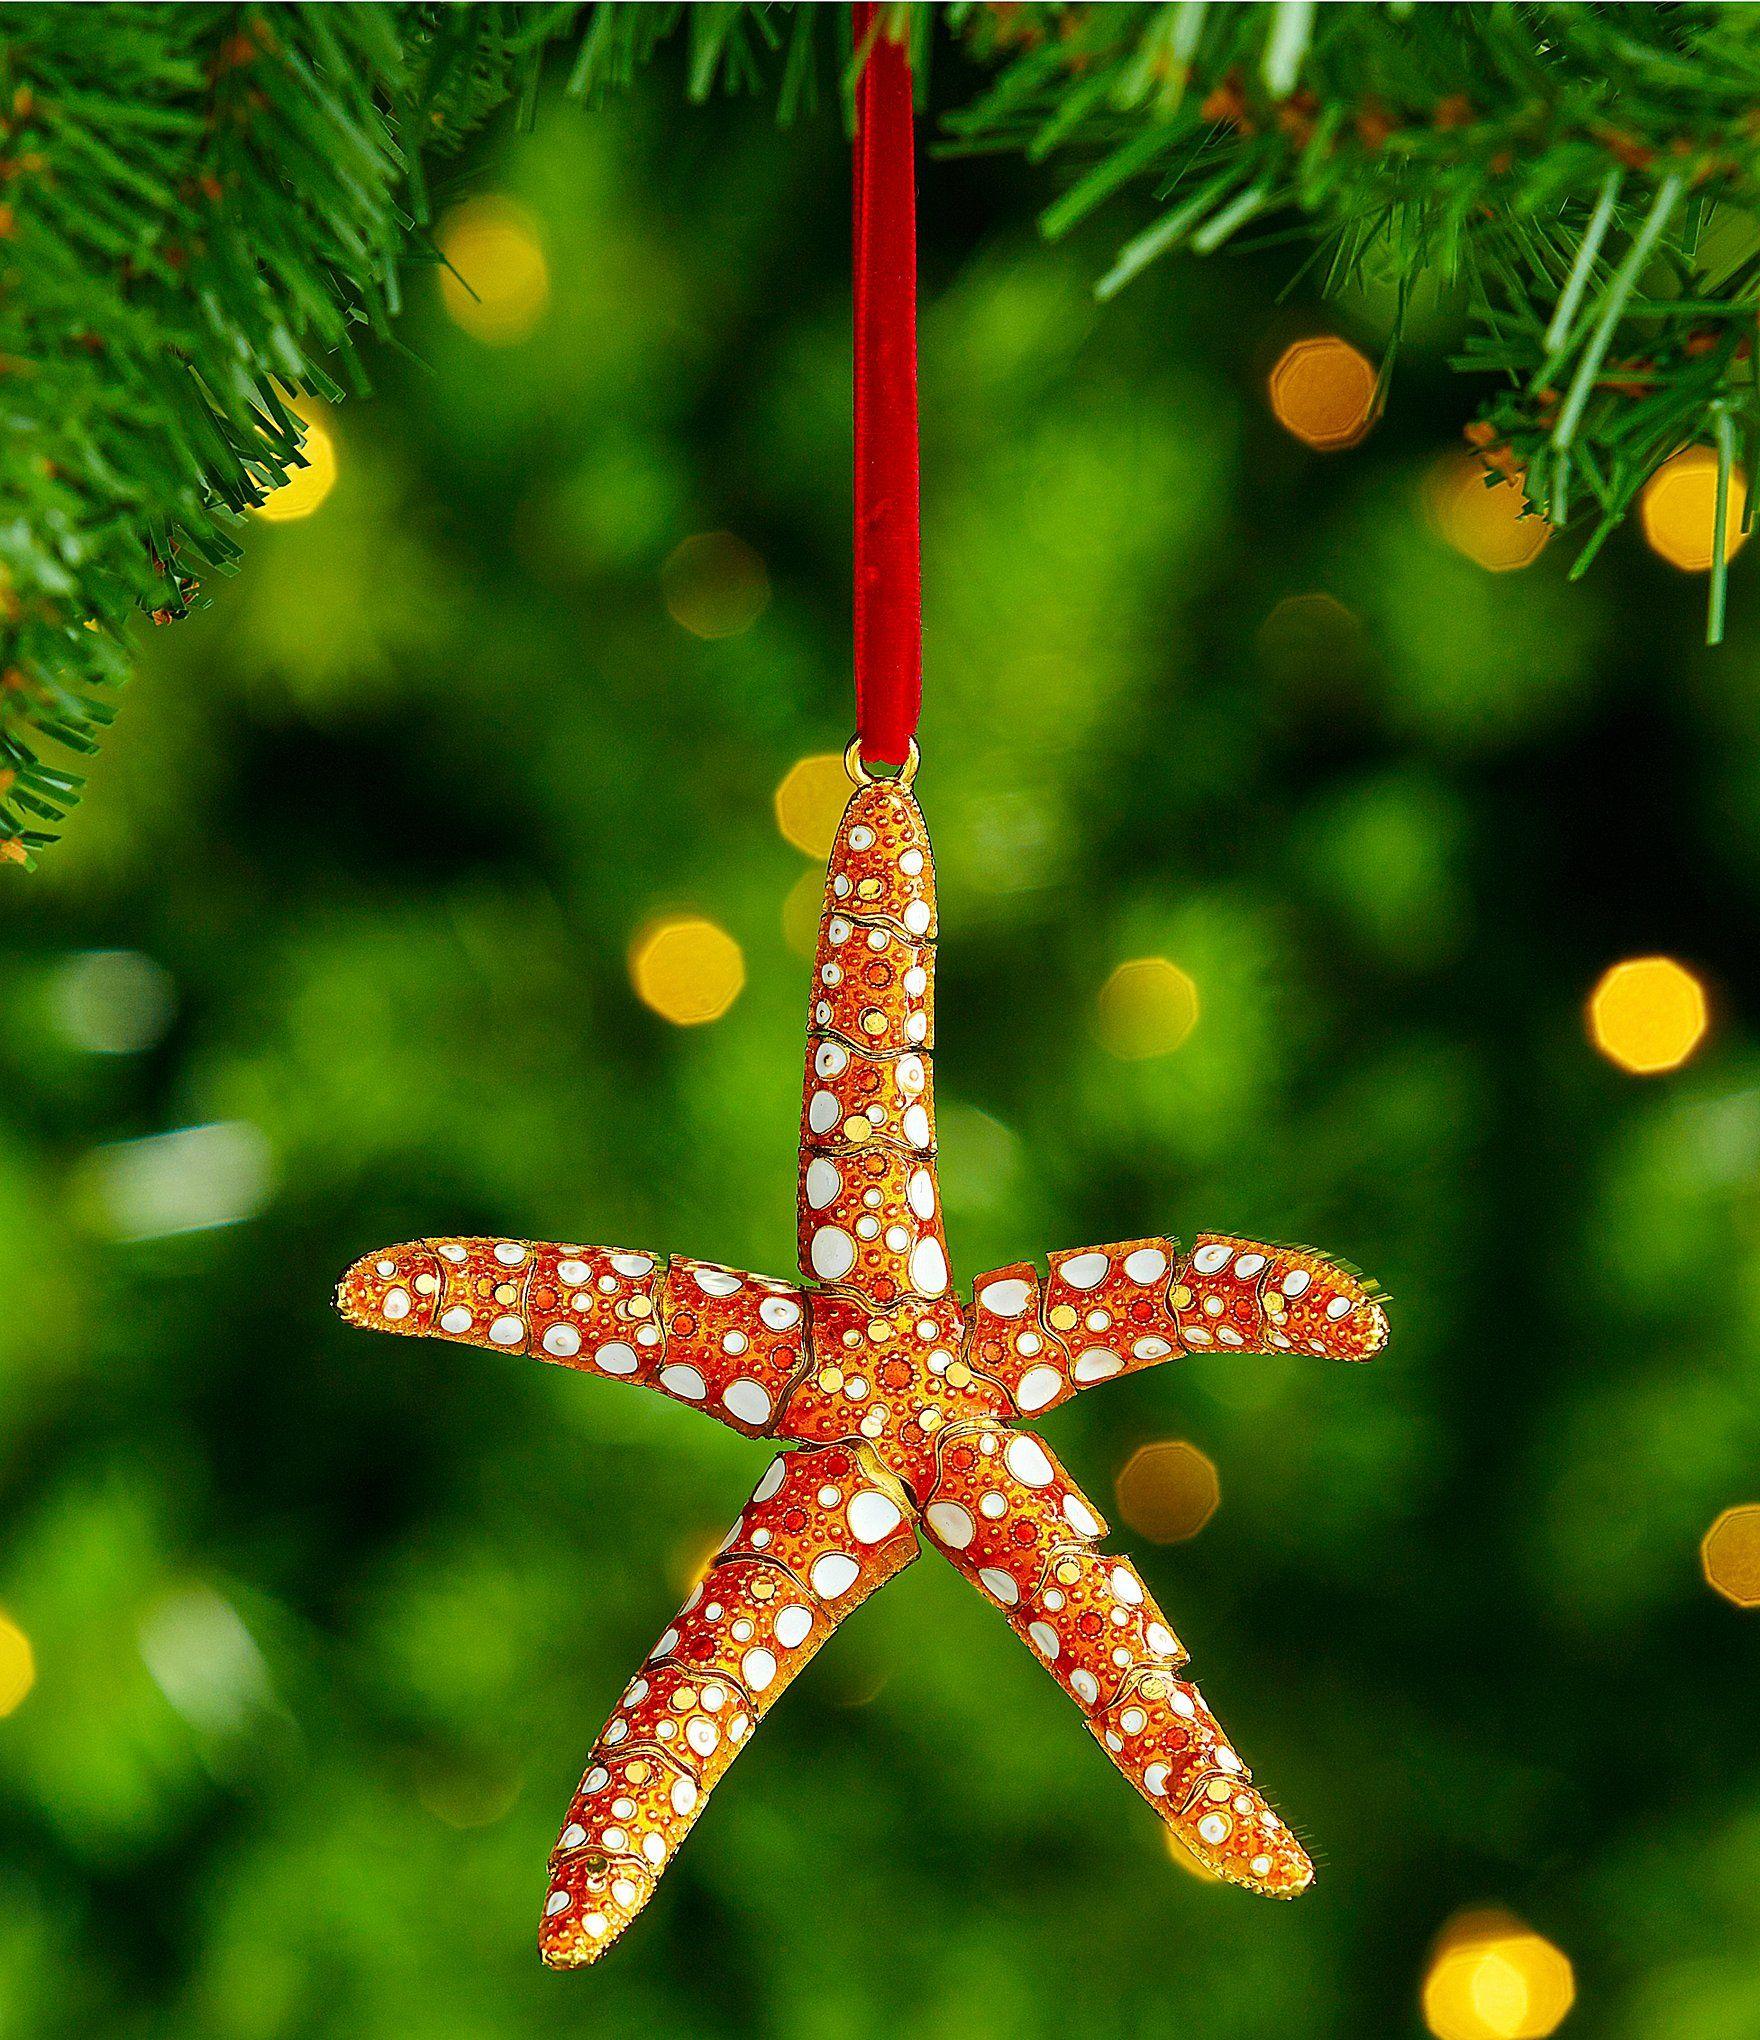 Trimsetter cloisonn collection starfish ornament dillards trimsetter cloisonn collection starfish ornament dillards dillardsstarfishchristmas ideasornamentschristmas decorationsornament solutioingenieria Choice Image